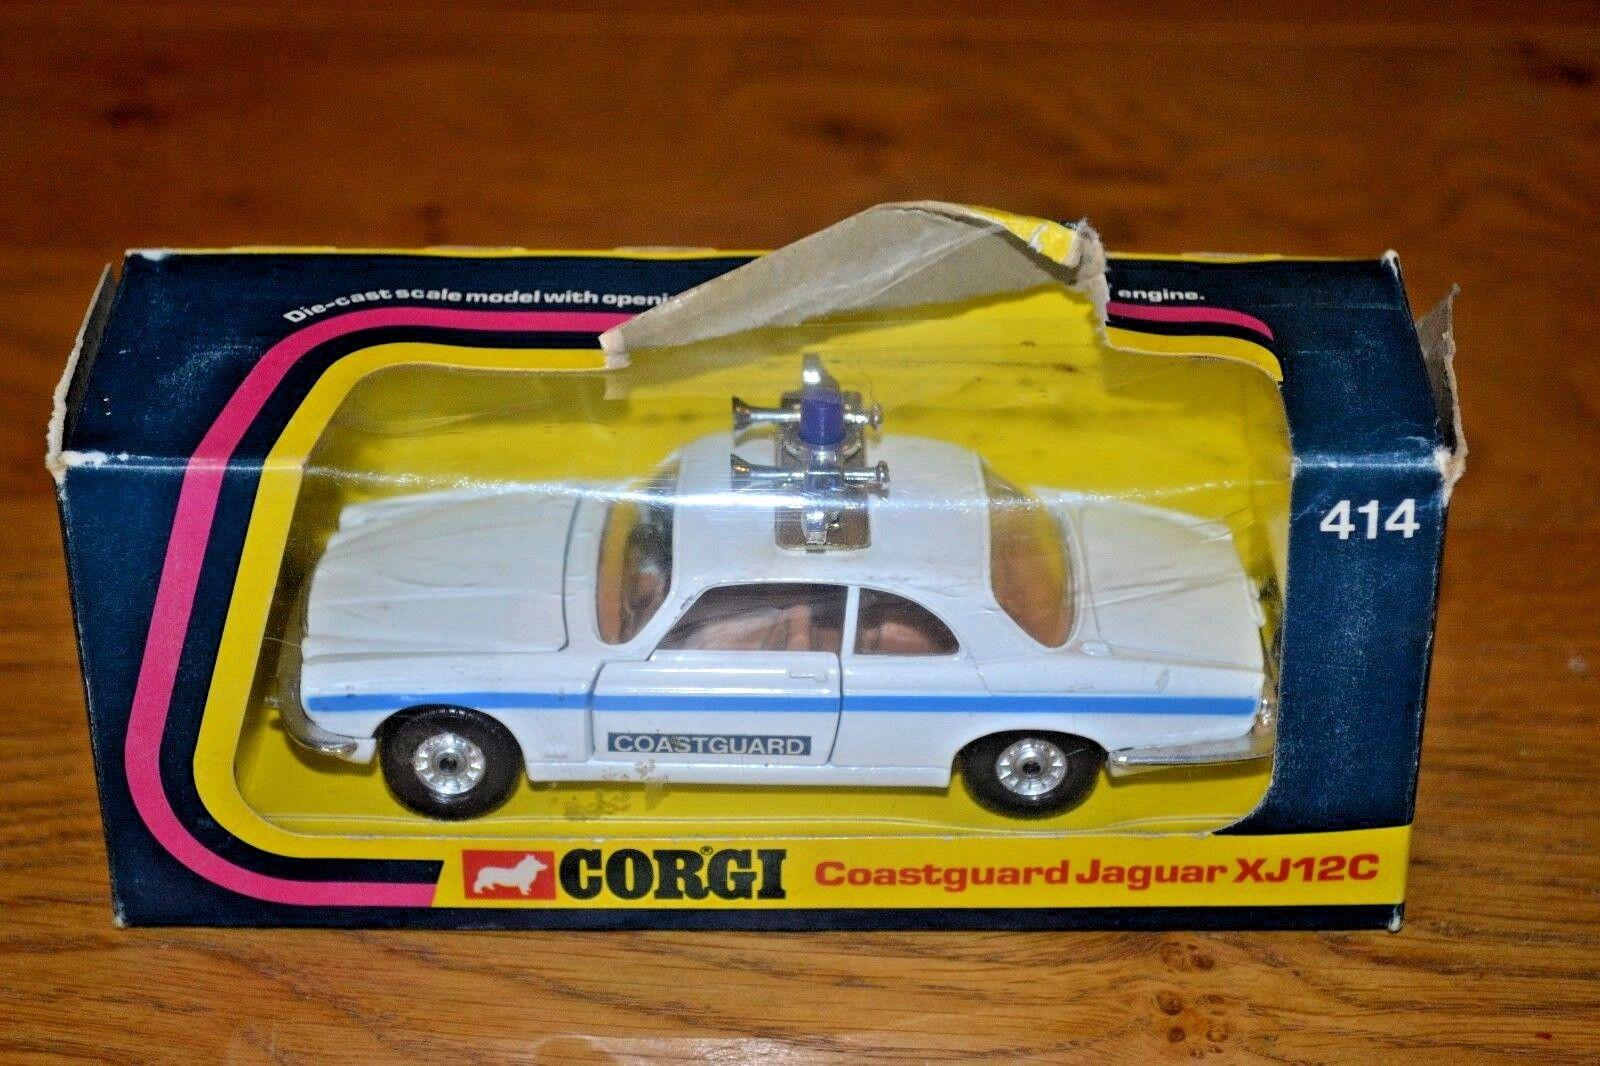 Corgi Whizzwheels Coastguard Jaguar XJ12C Car; No 414; Original Window Box